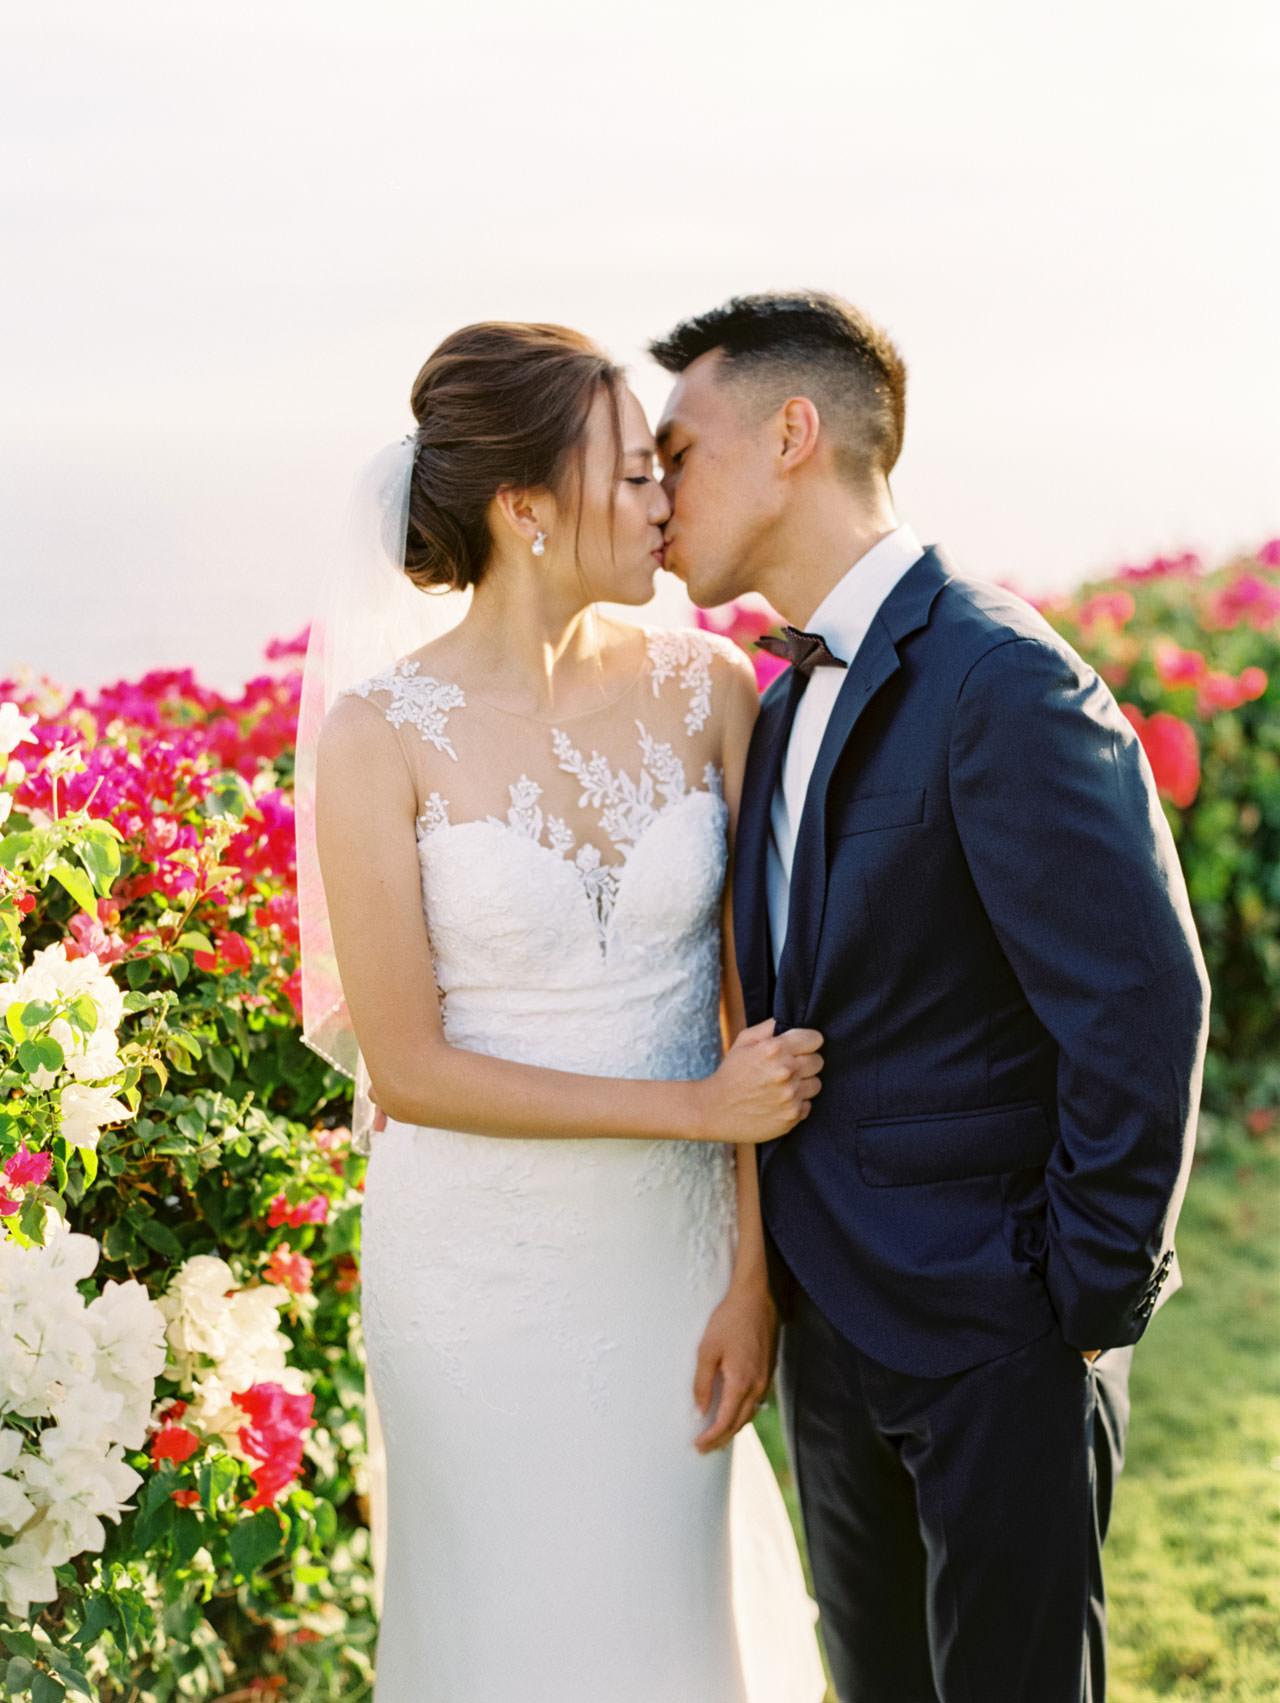 Uluwatu Cliff Wedding with Chinese Wedding Ceremony 29